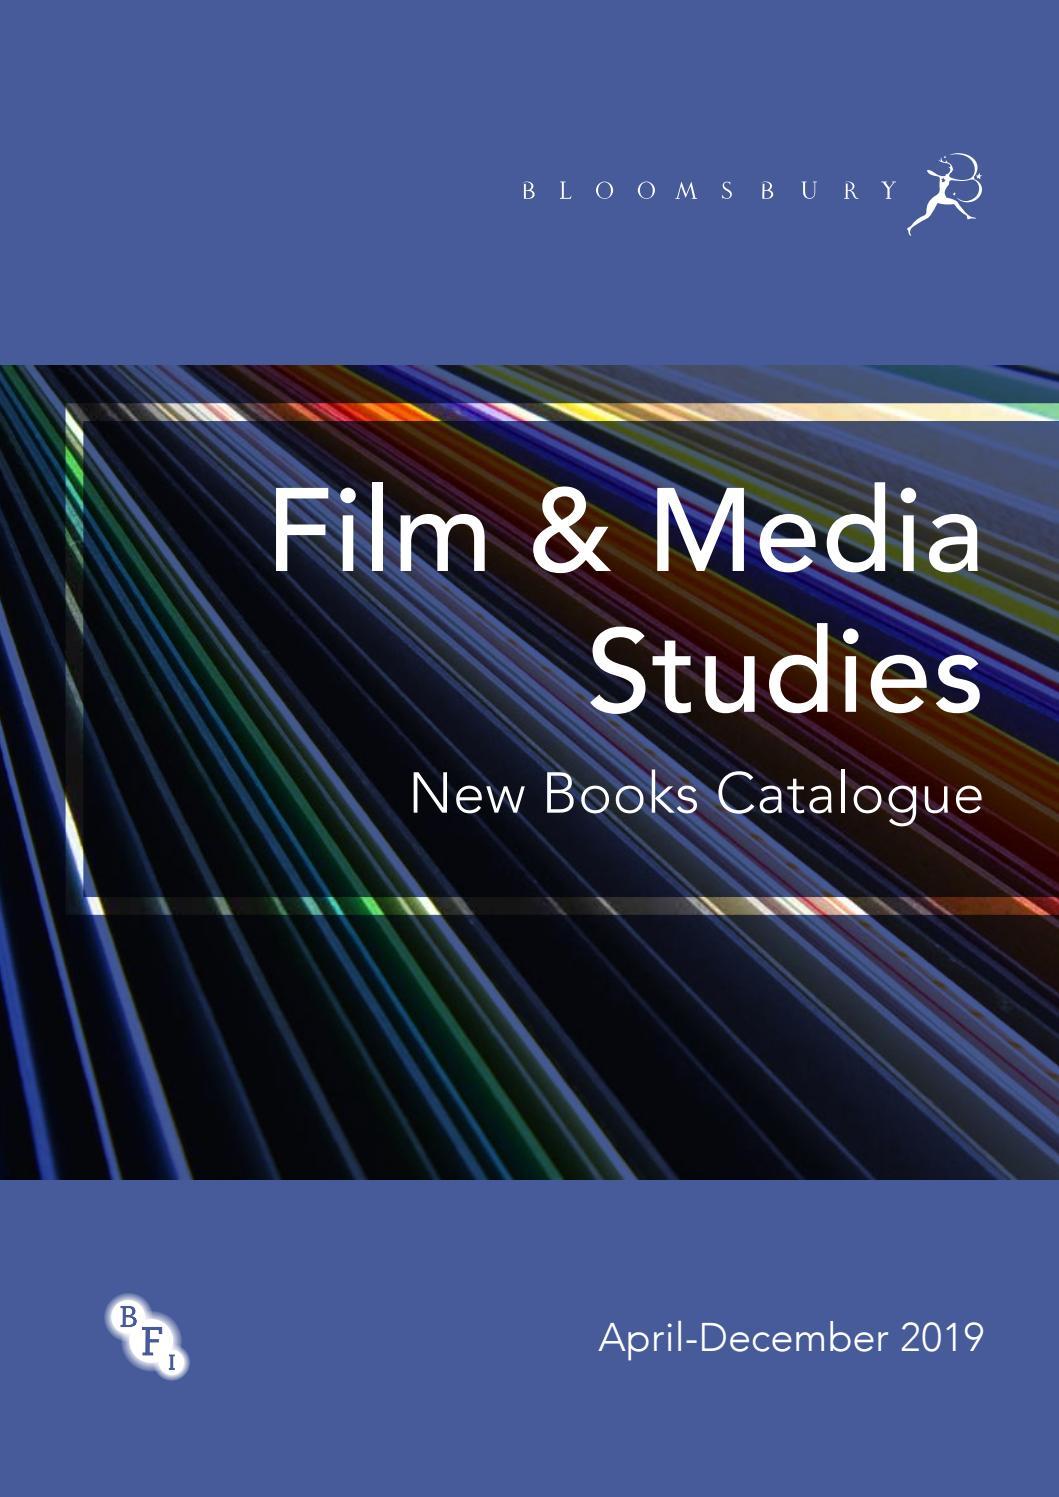 Film & Media Studies Catalogue April-December 2019